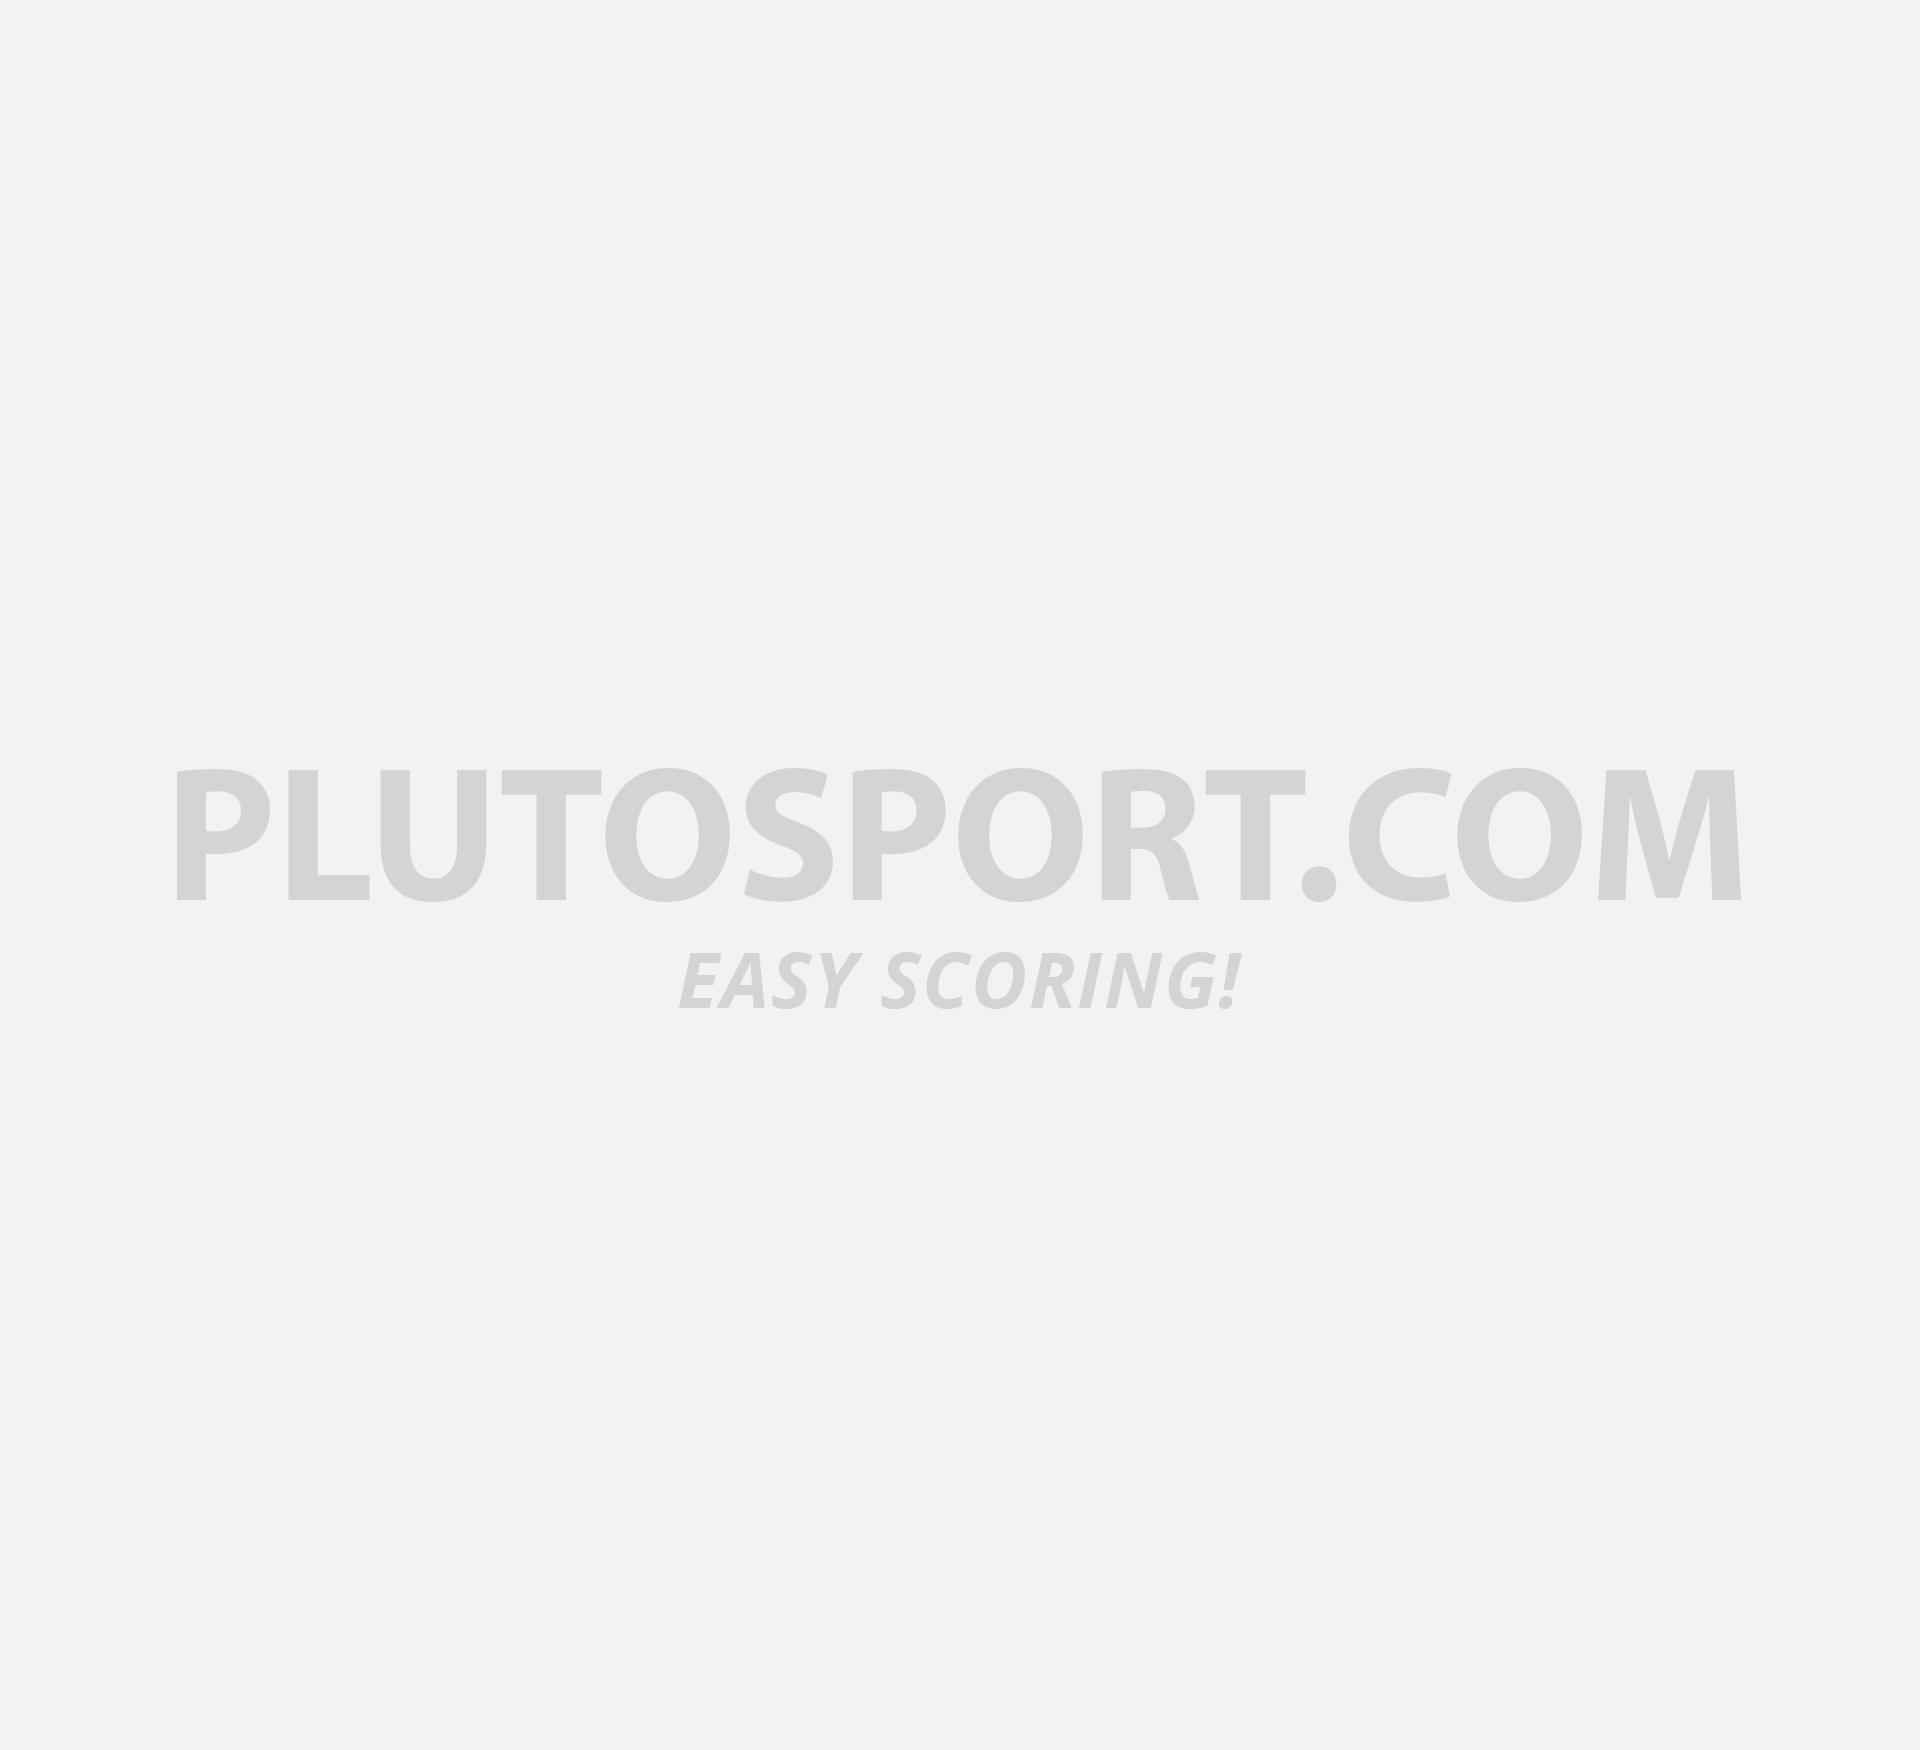 0694c8e2c08 Nijdam Rollerskate Canvas Rambler - Rollerskates - Skates - Skating -  Sports   Plutosport